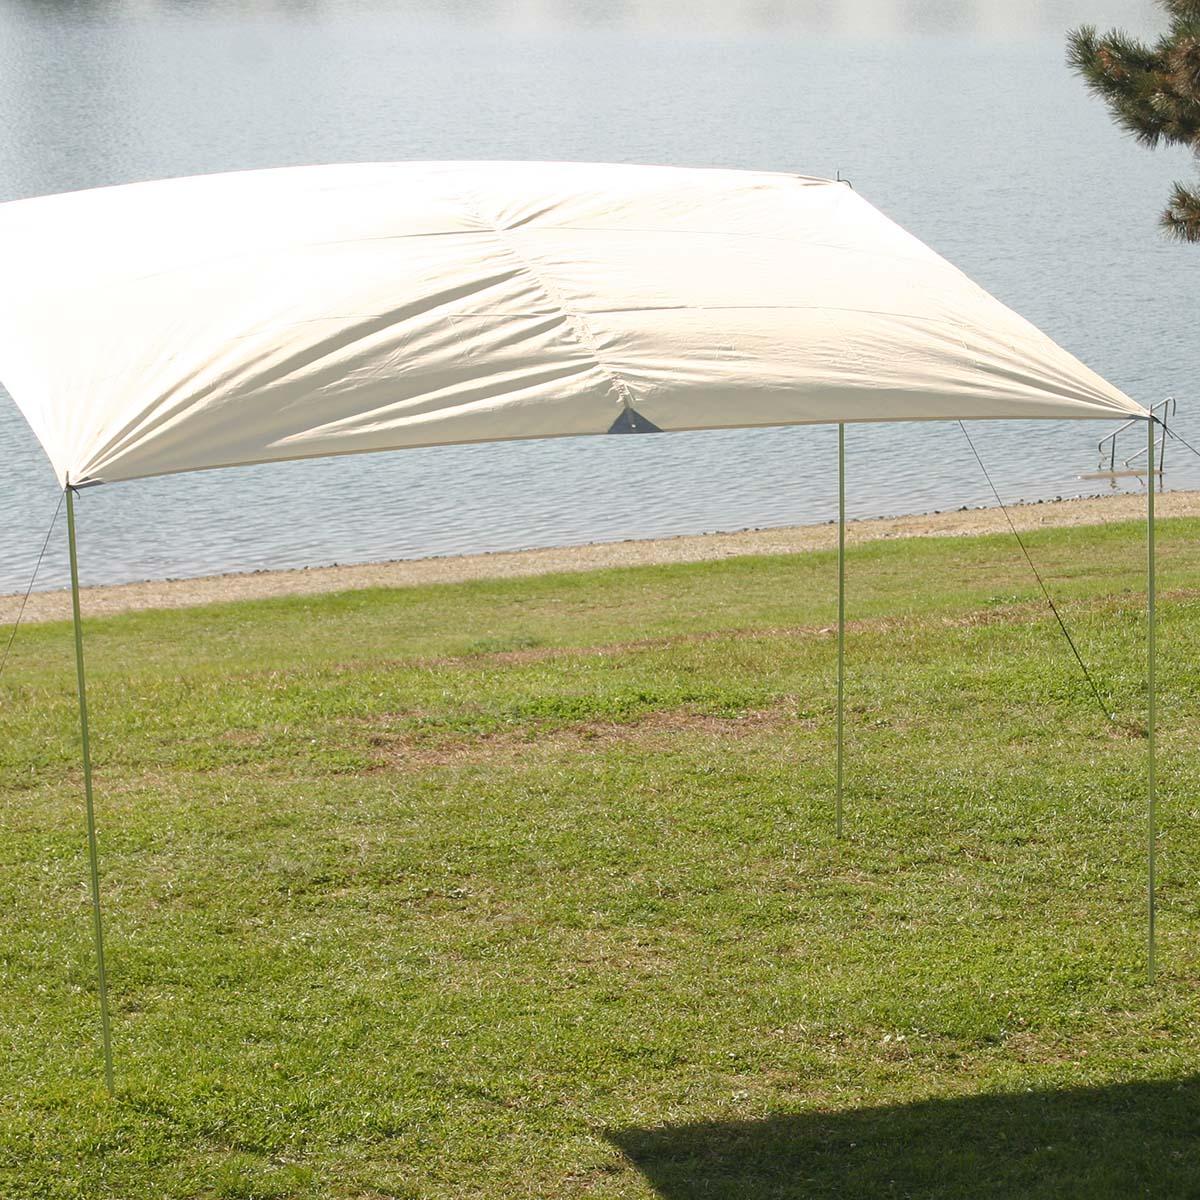 montis spring sonnensegel wei ca 3x2m 3 5kg ebay. Black Bedroom Furniture Sets. Home Design Ideas